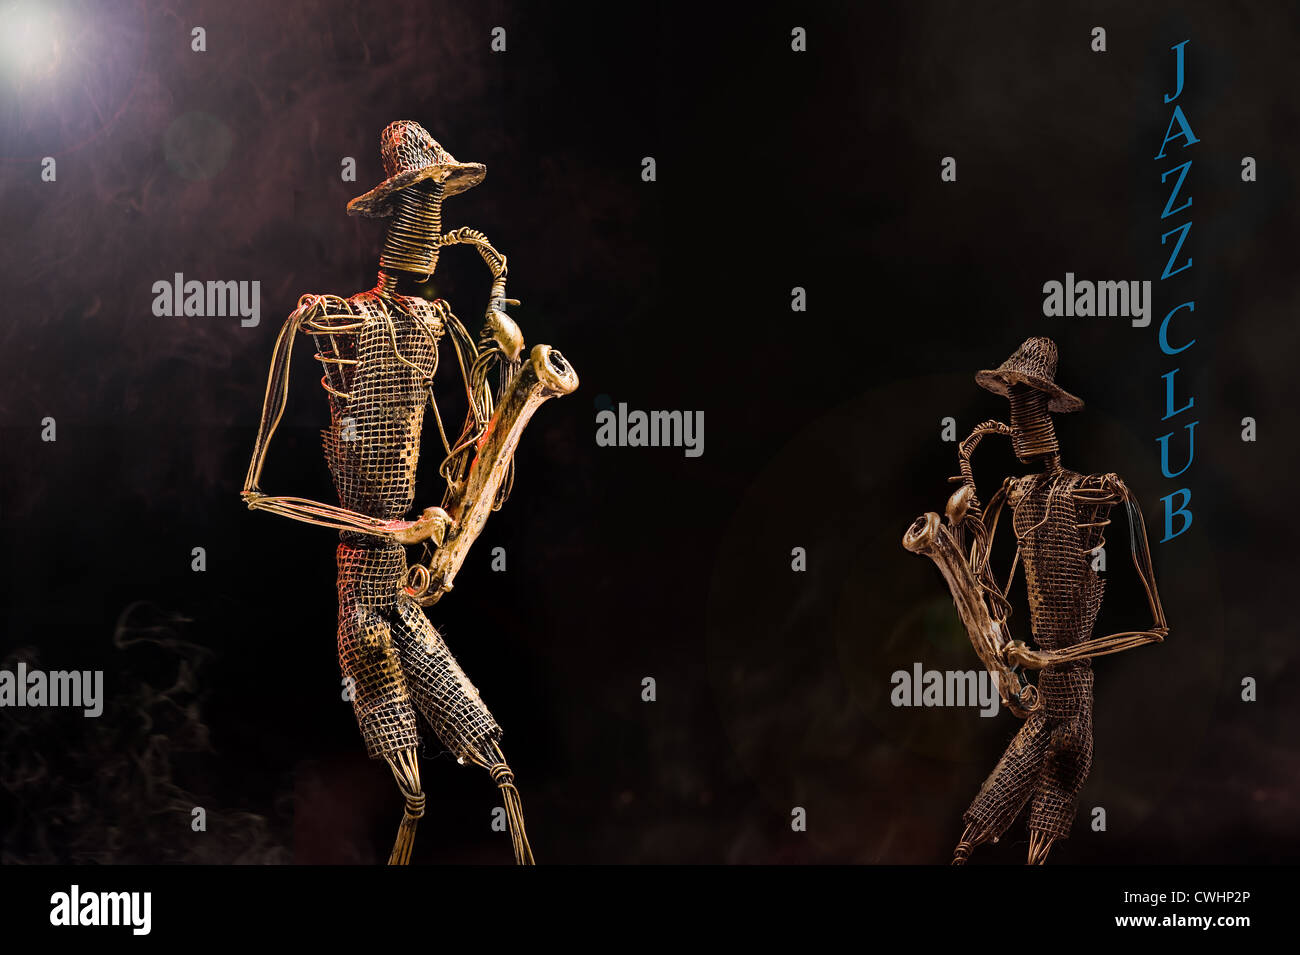 Interpretation of a smoky jazz club. - Stock Image